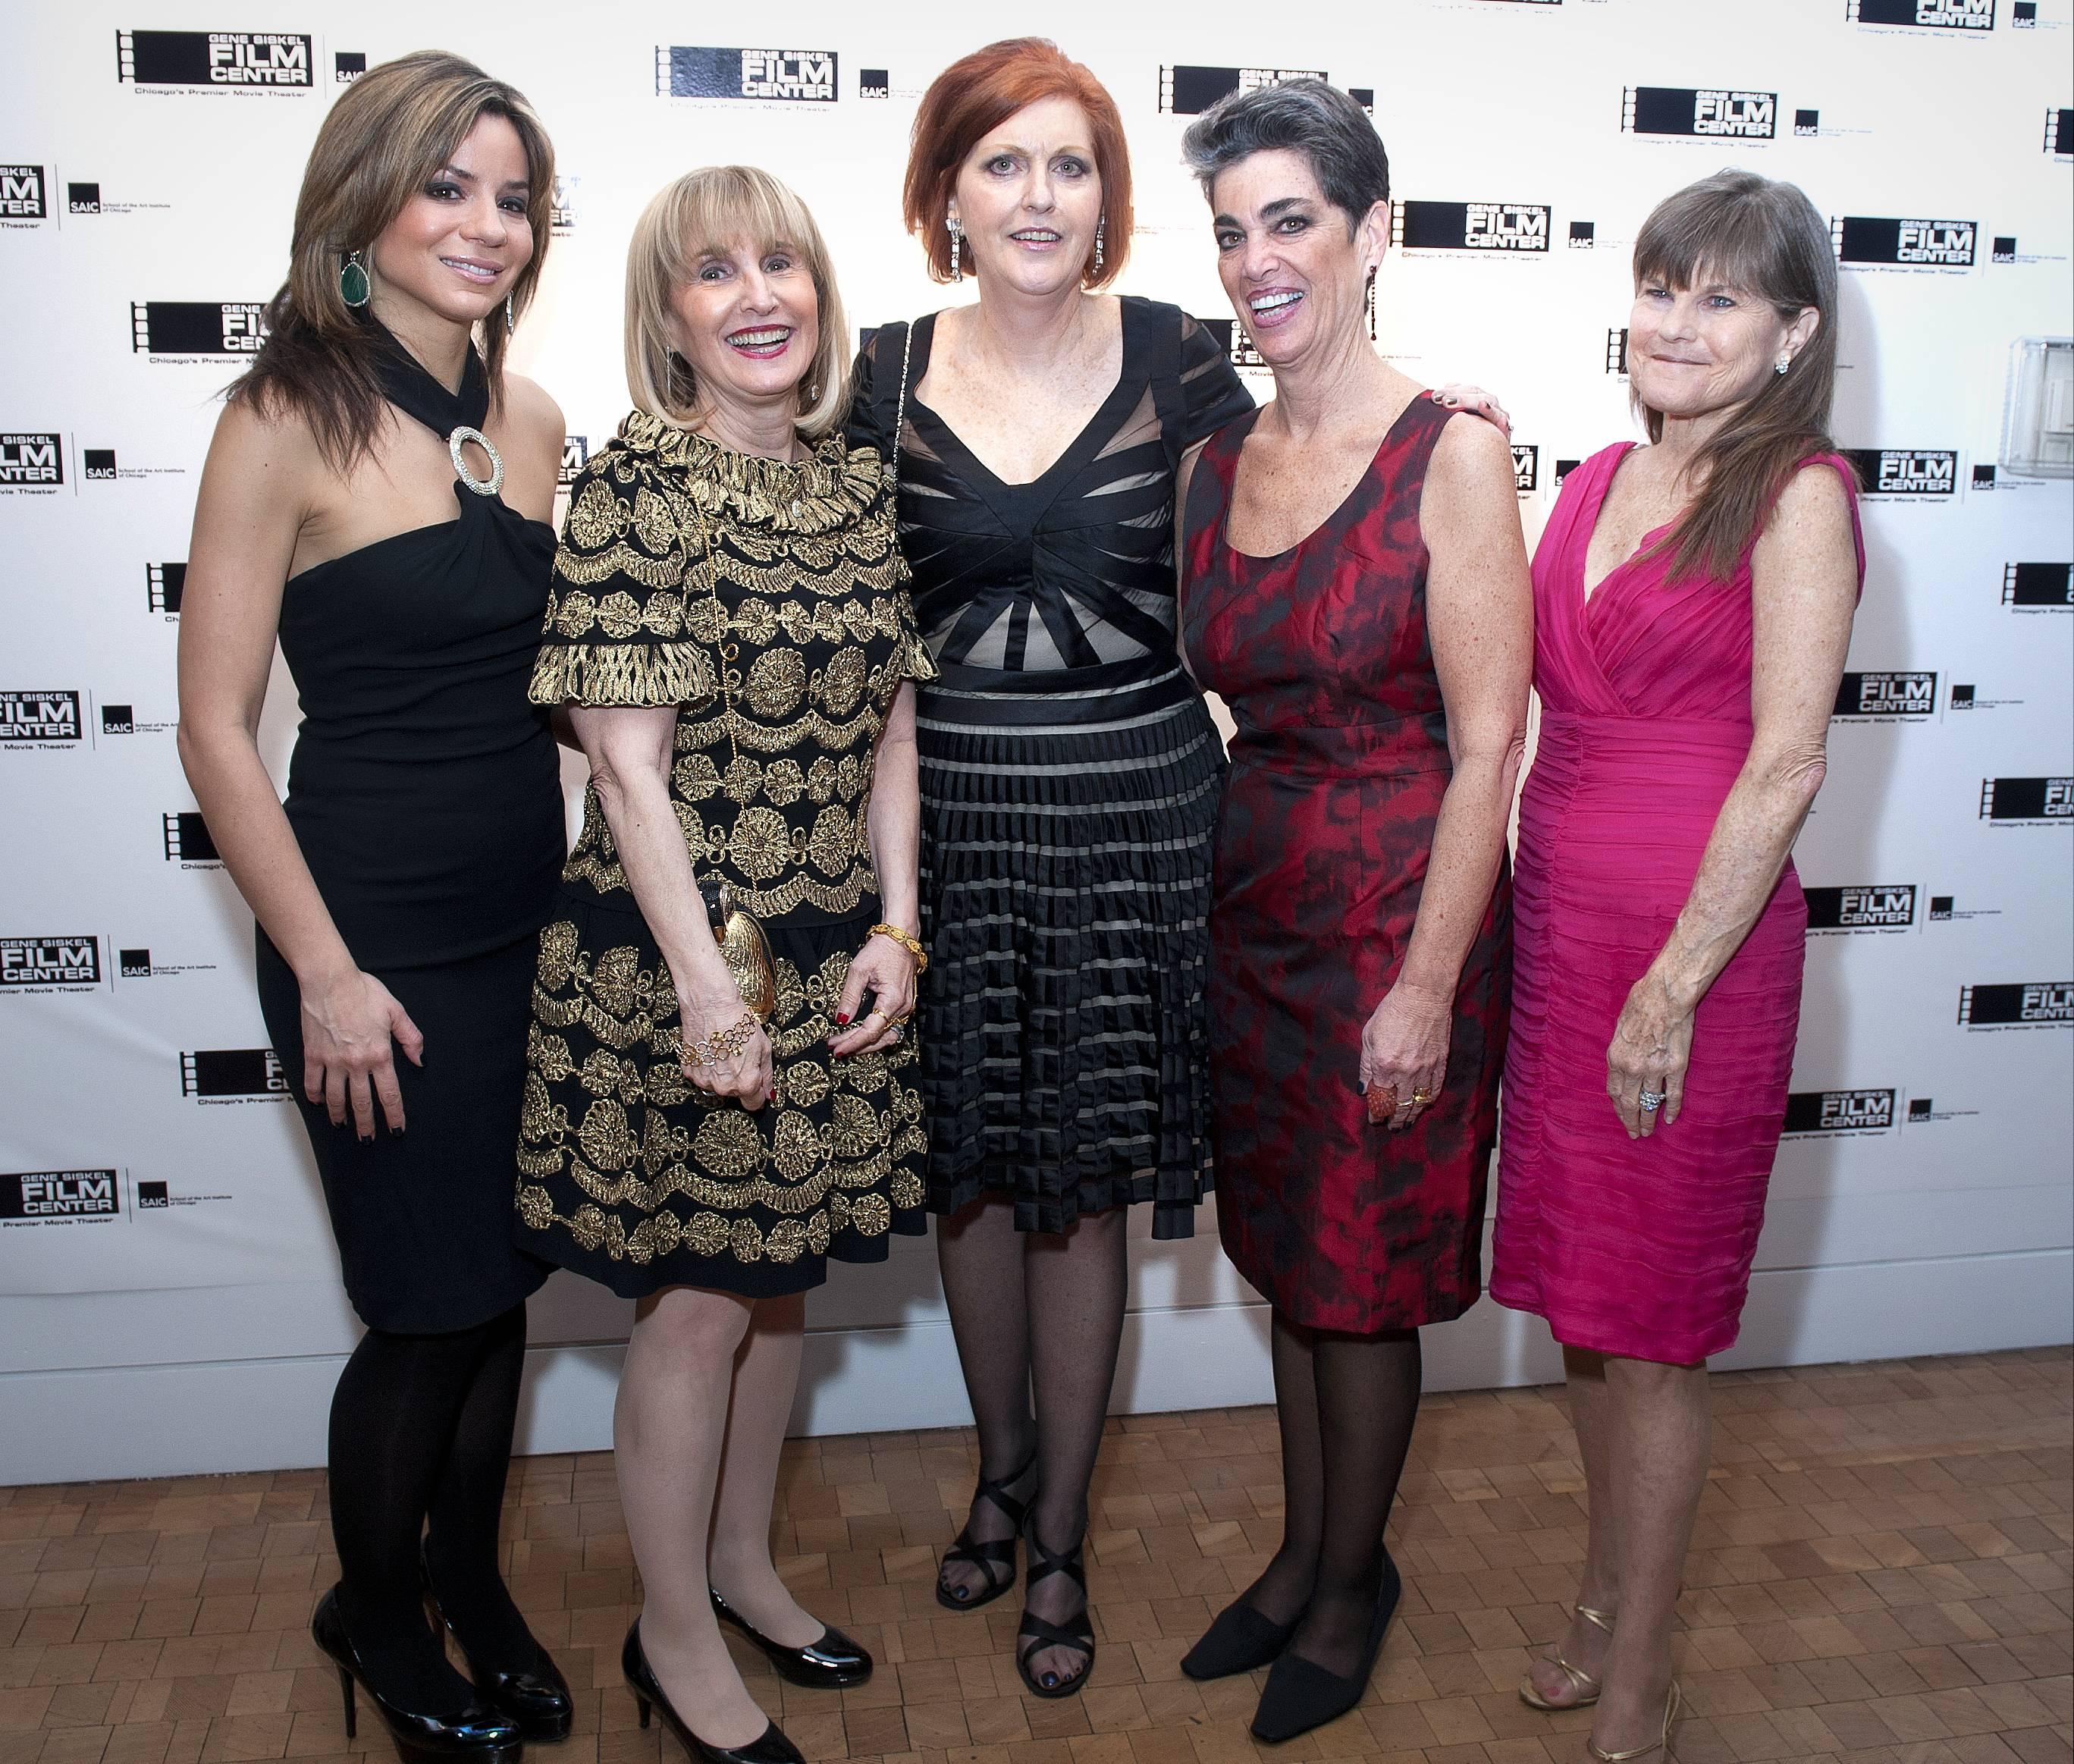 0222_Susanna Negovan, Ellen Sandor, Jean de St. Aubin, Michelle Cucchiaro, Kristin Anderson (Susanna and Kristin co-chairs)